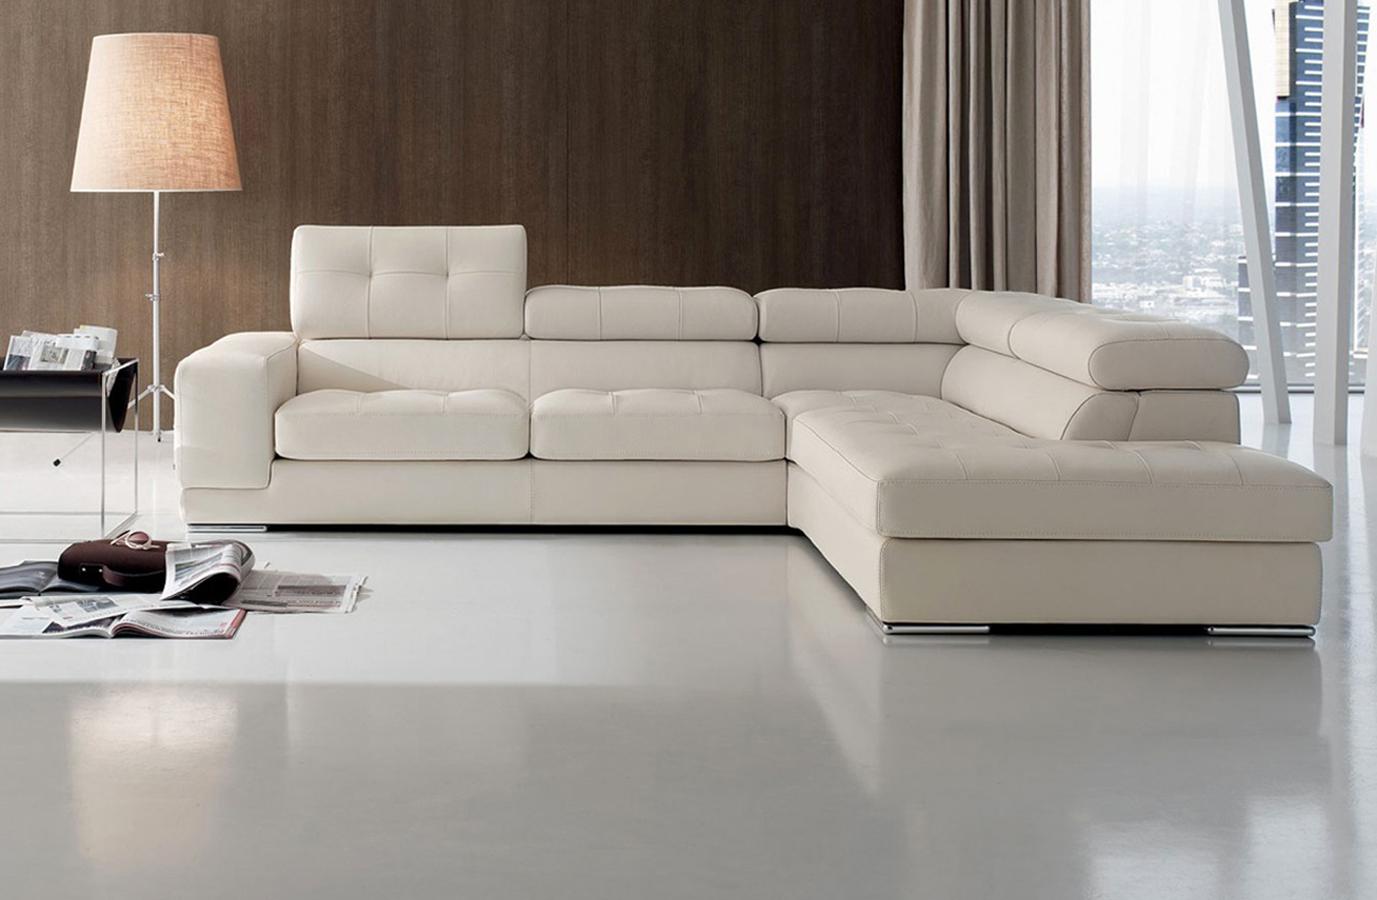 Marinellihome-divano-Floor-moderno-design-stoffa-pelle-ecopelle ...